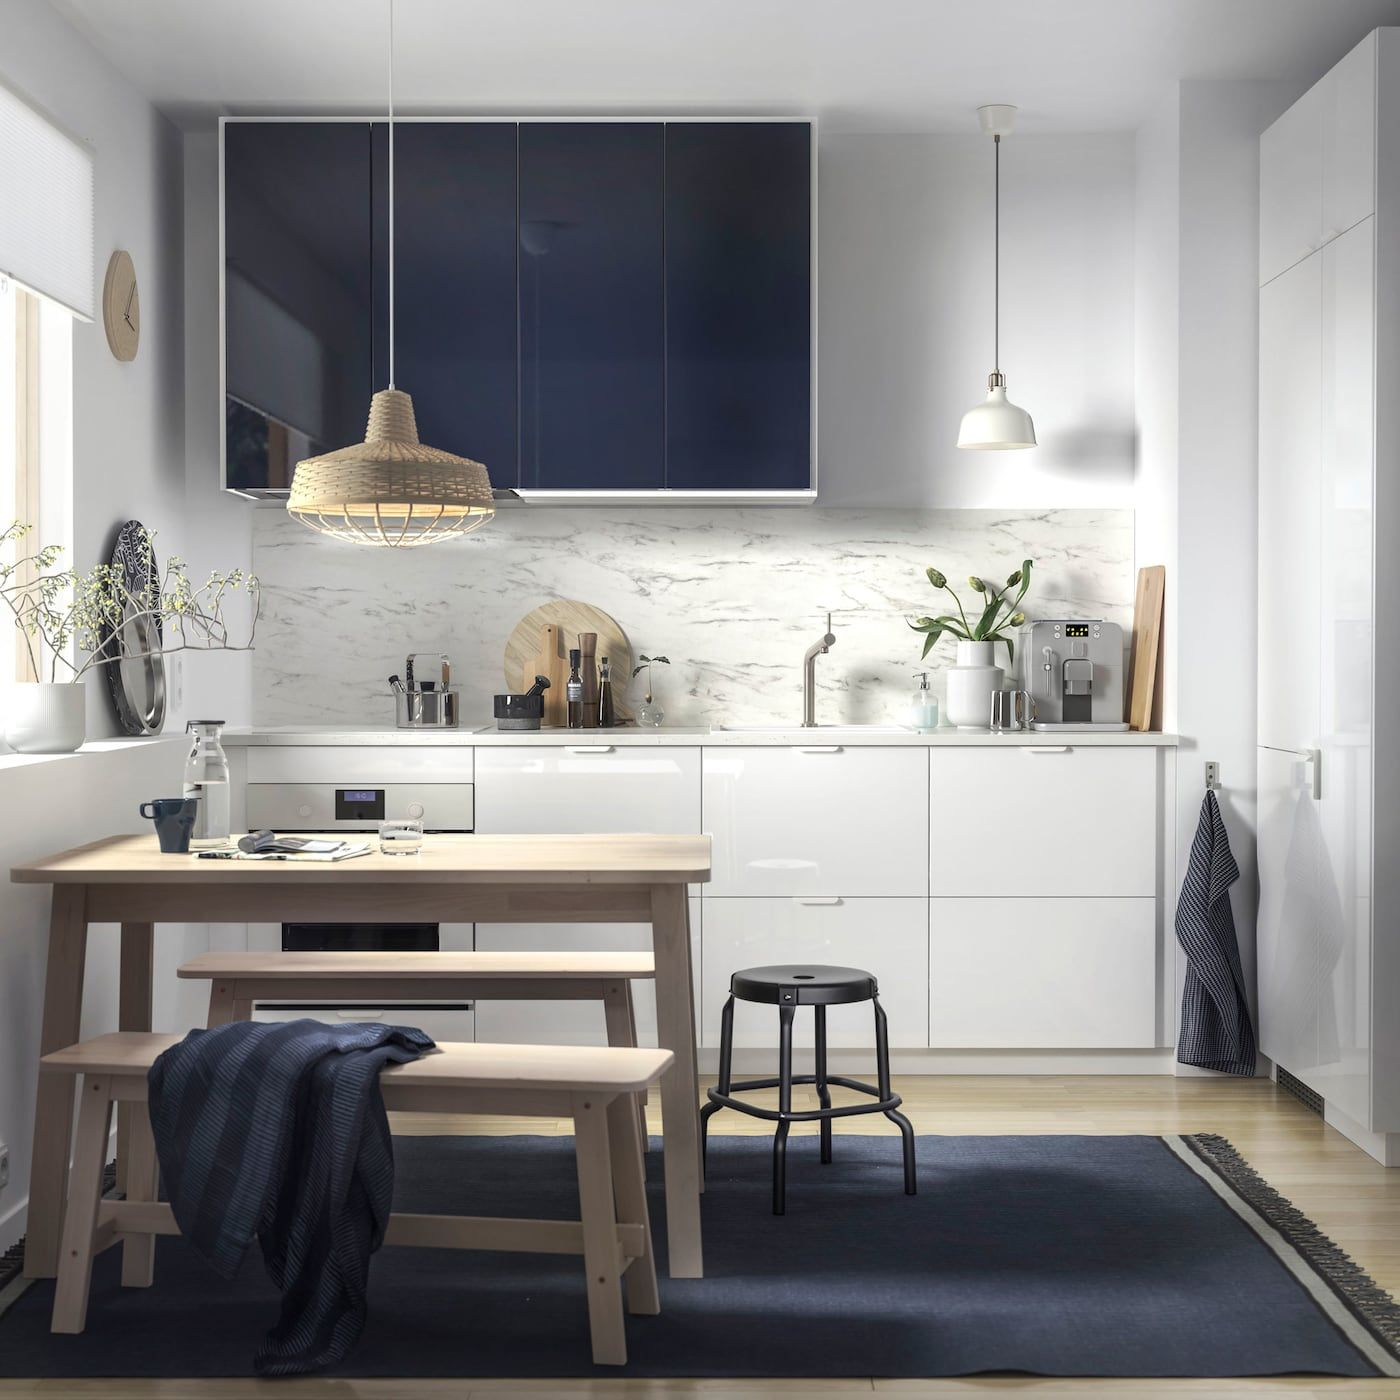 Pienen Keittion Selkeat Linjat En 2019 Kitchen Cuisine Ikea